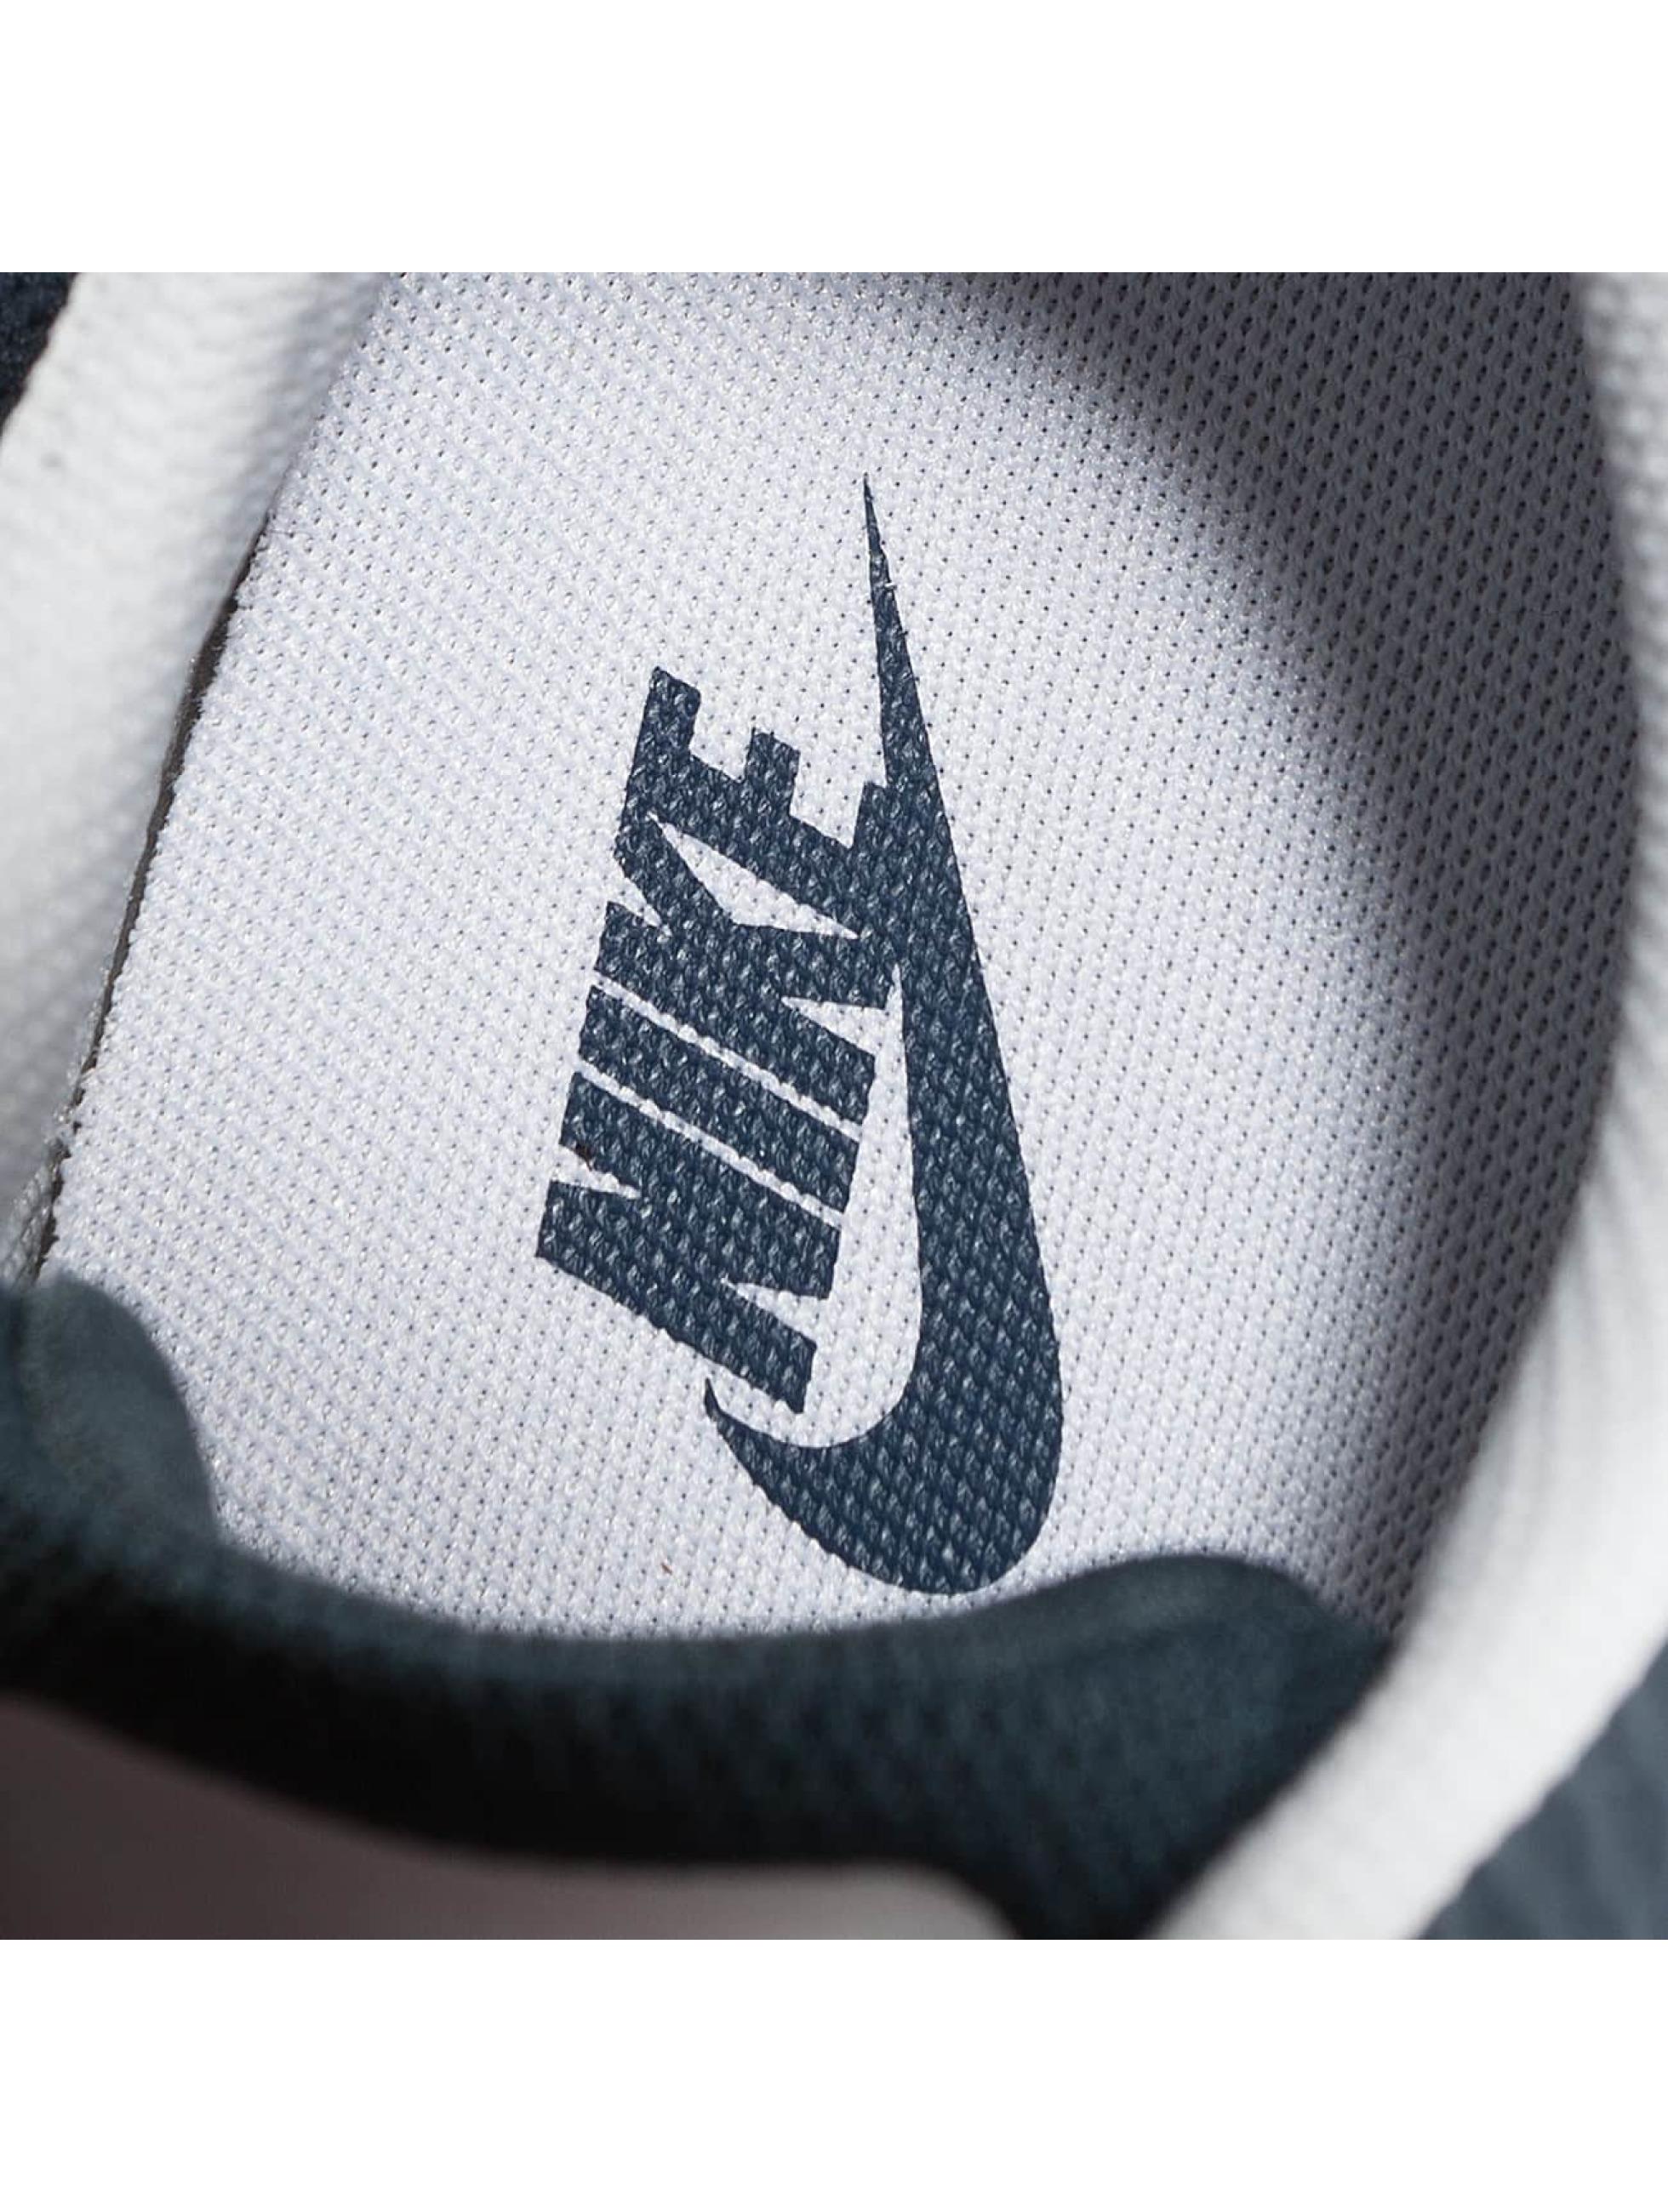 Nike Zapatillas de deporte Air Max Tavas azul